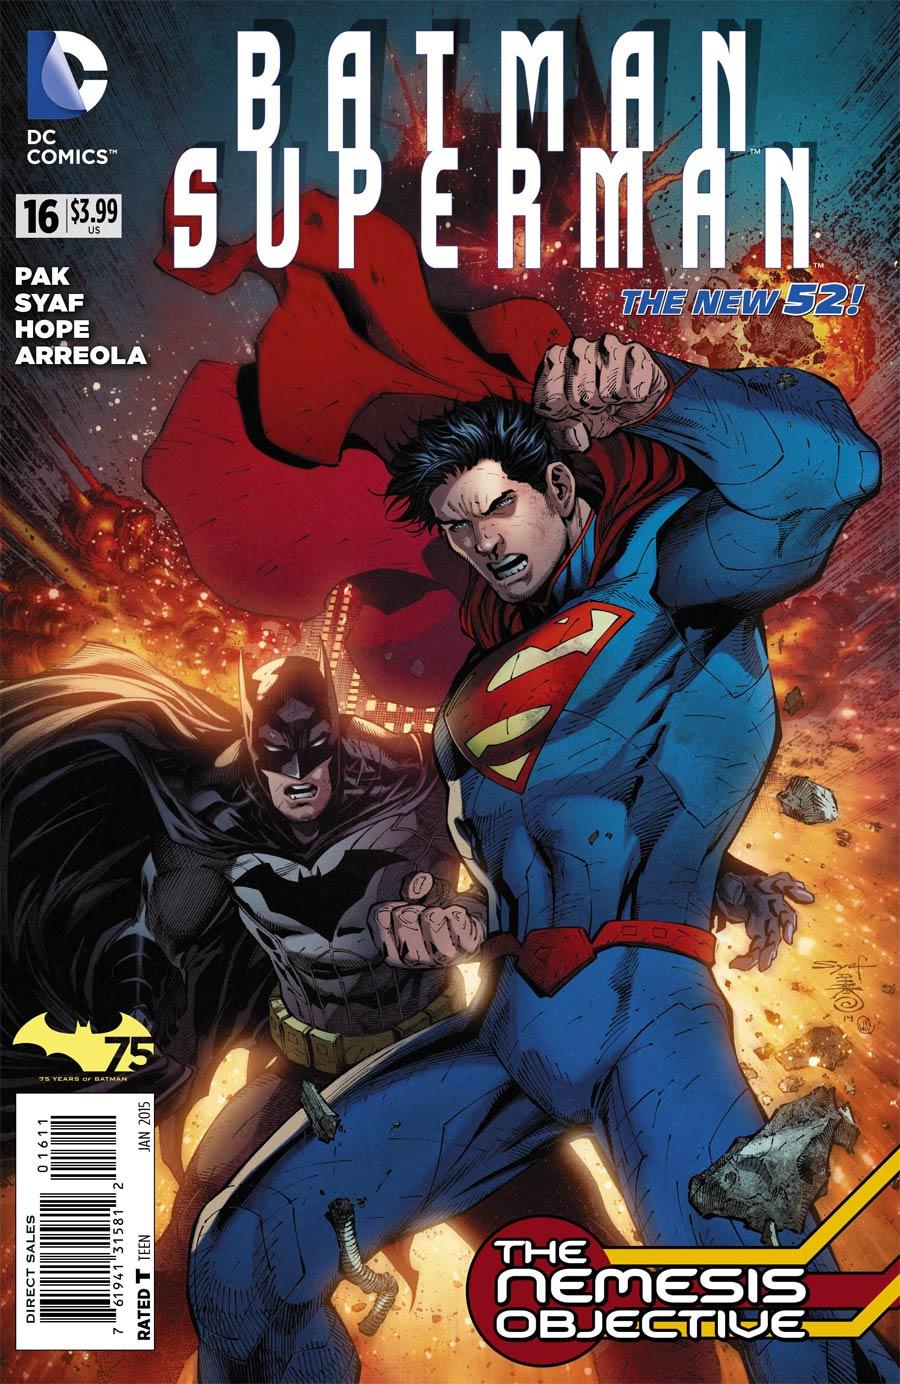 Batman Superman #16 Cover A Regular Ardian Syaf Cover